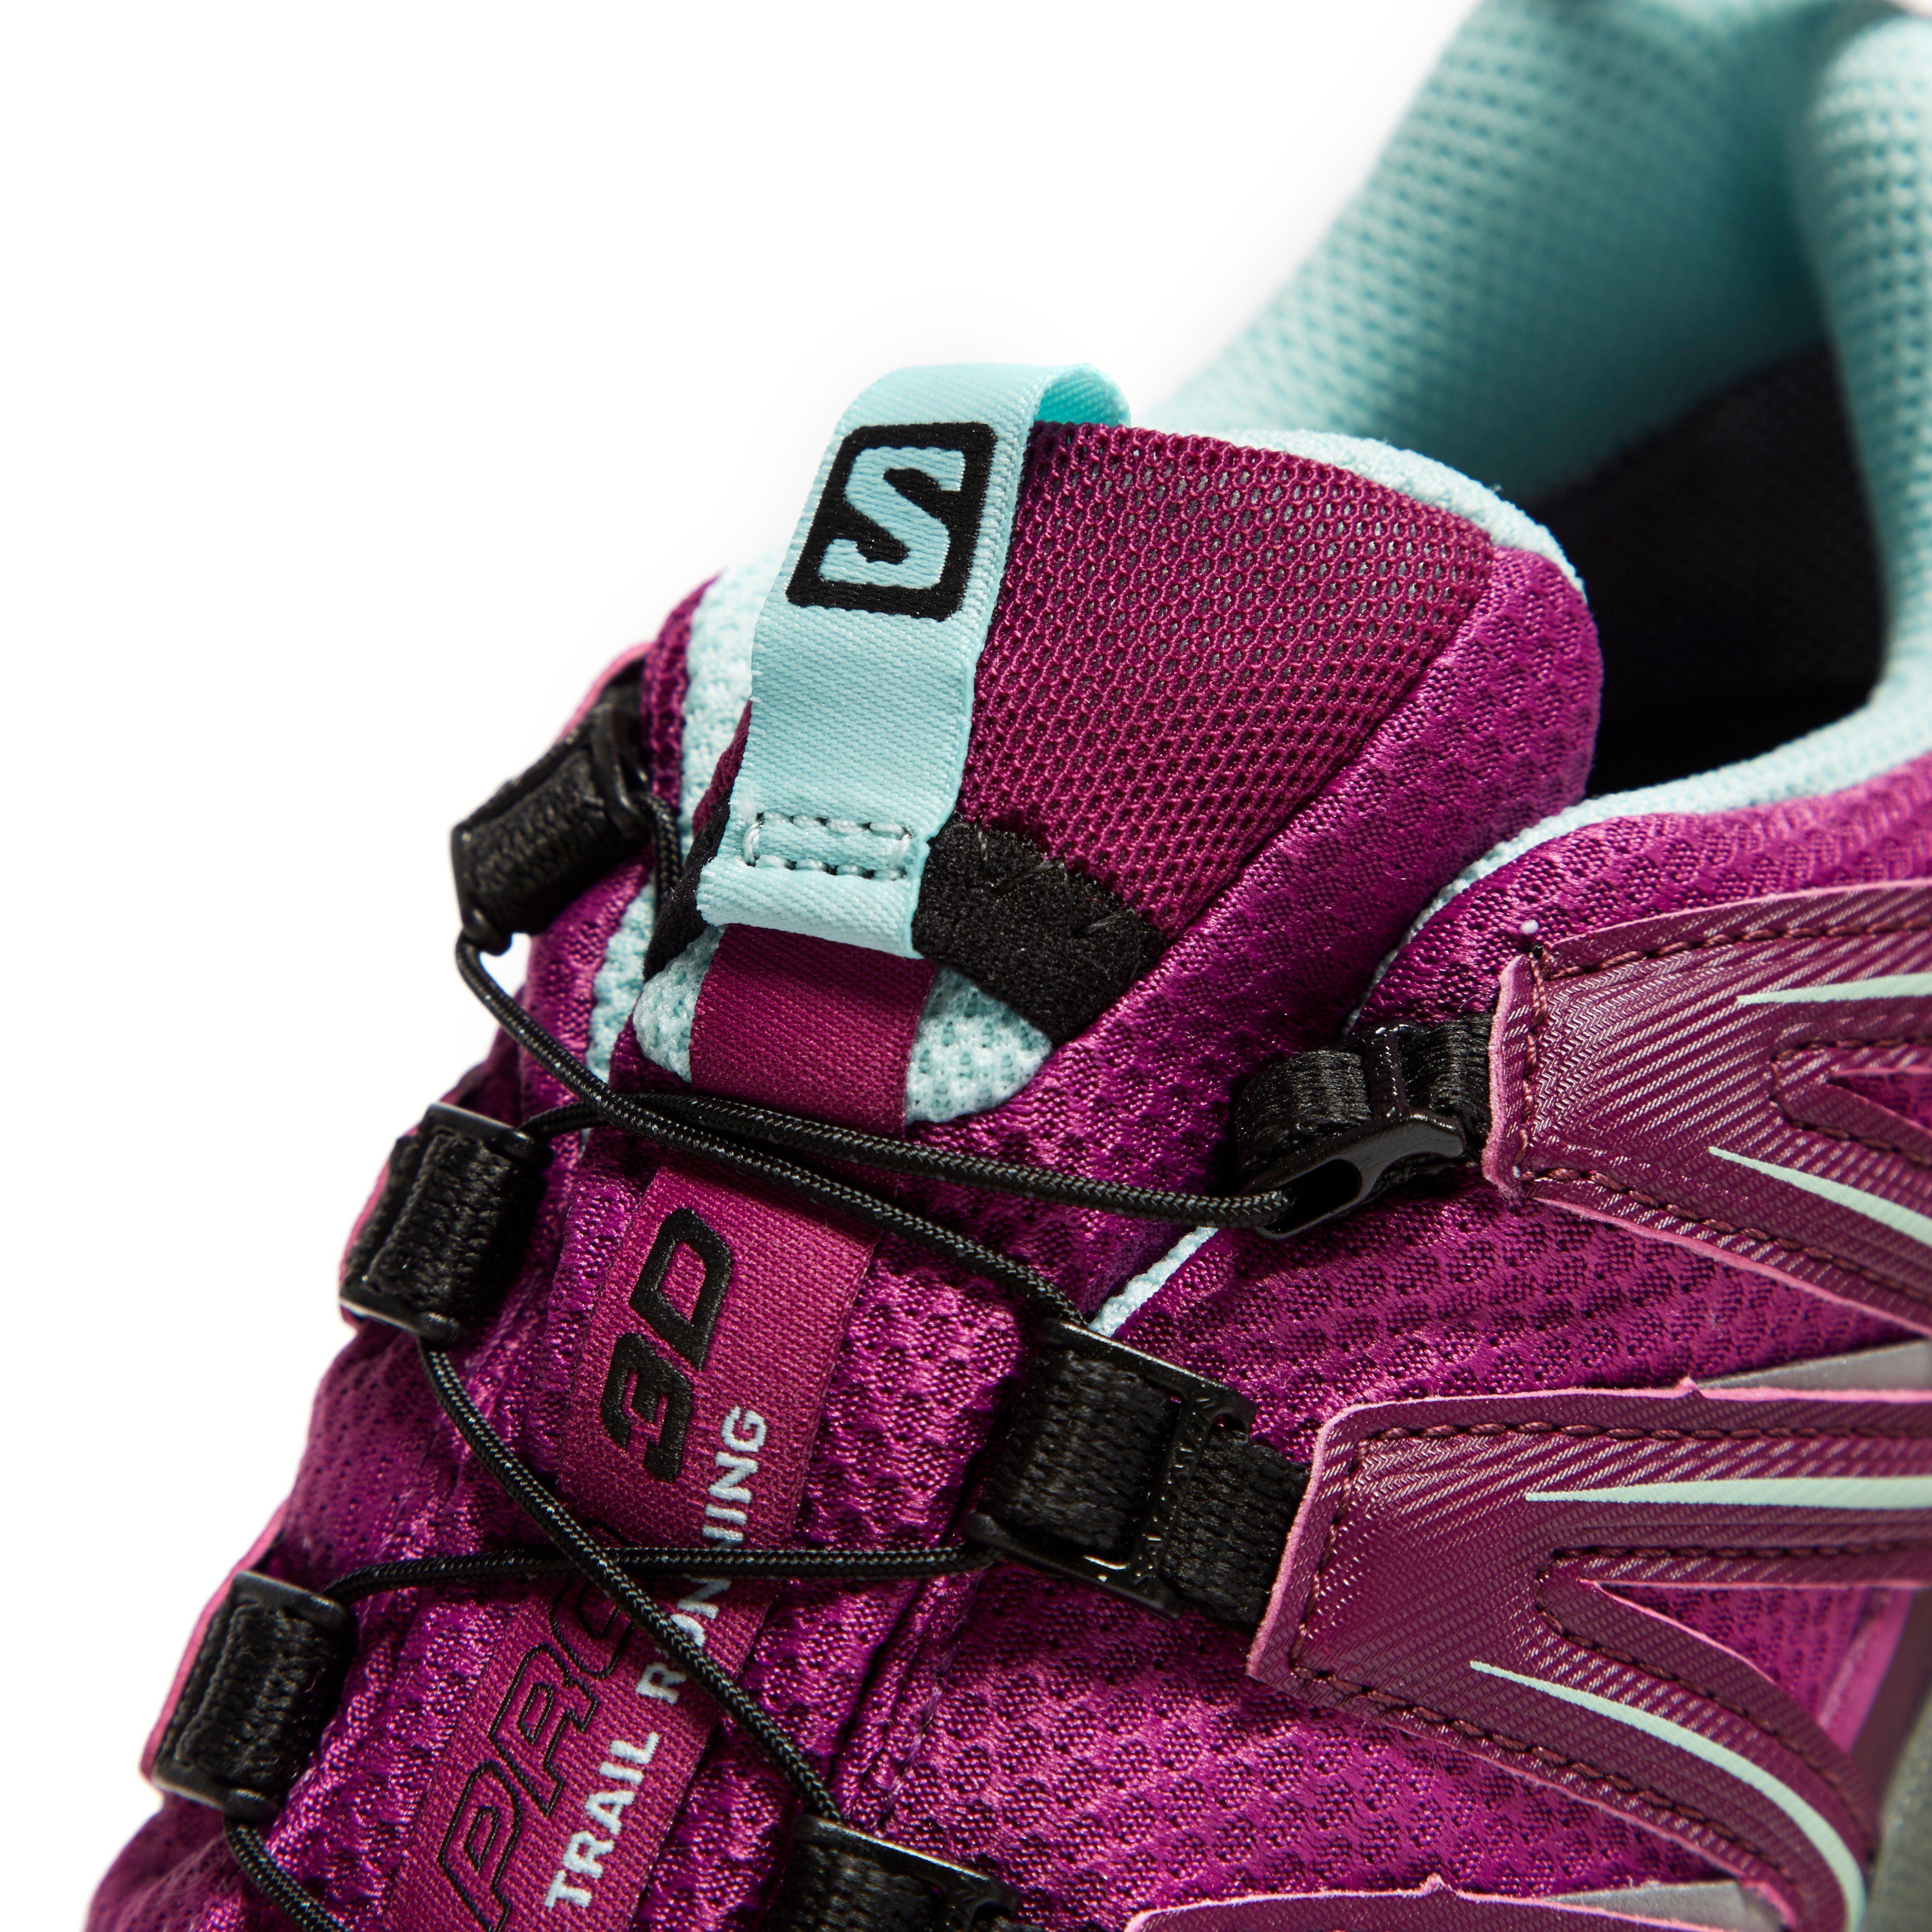 Salomon XA Pro 3D GTX Women's Trail Running Shoes